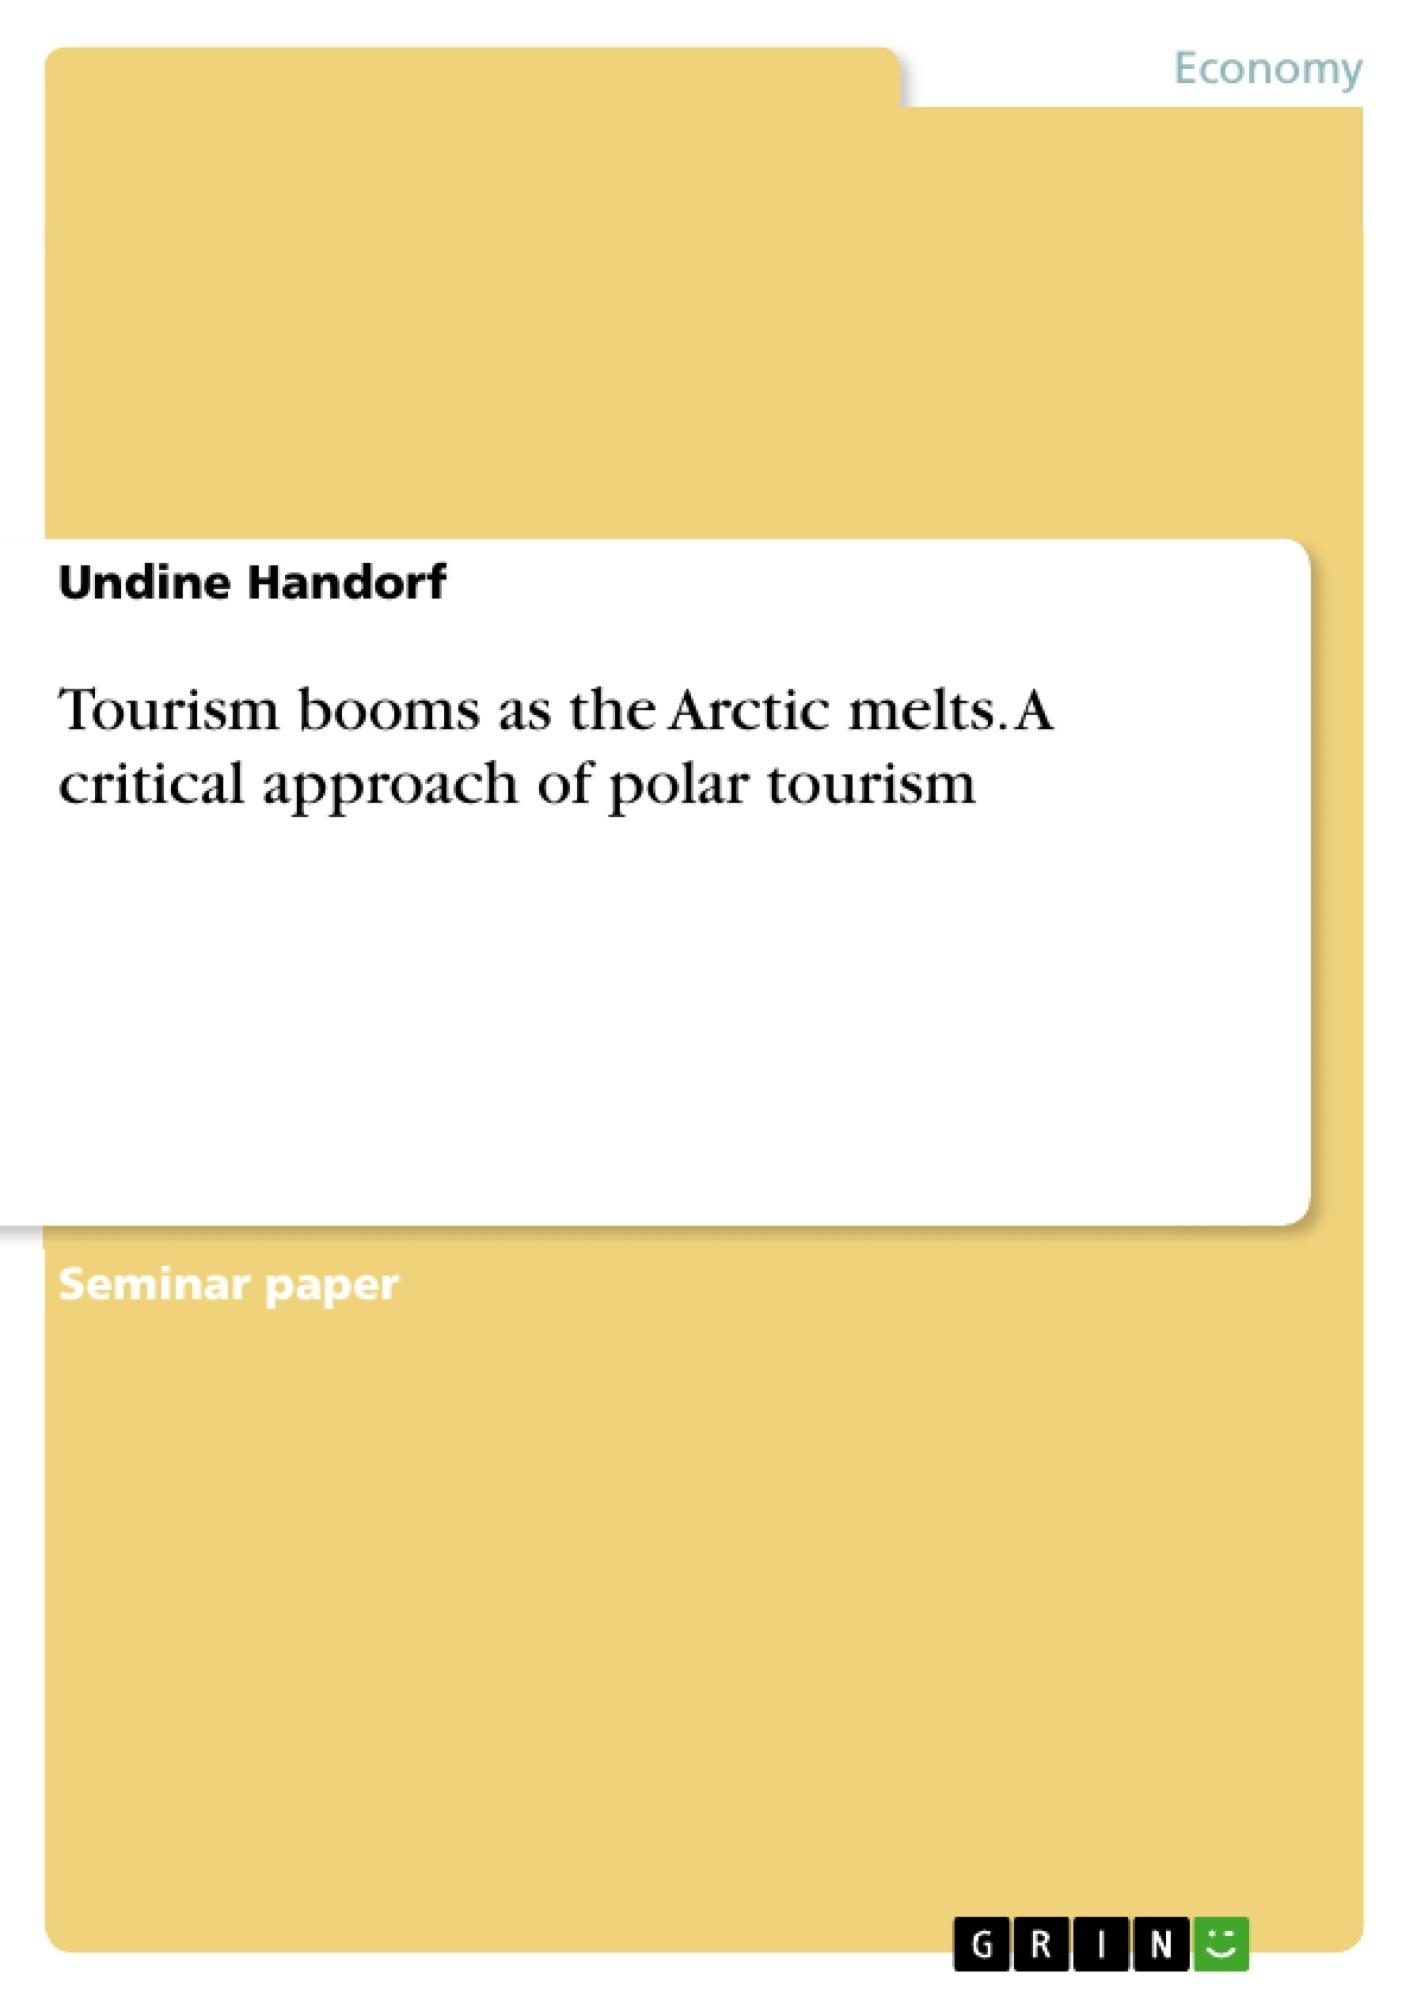 Title: Tourism booms as the Arctic melts. A critical approach of polar tourism